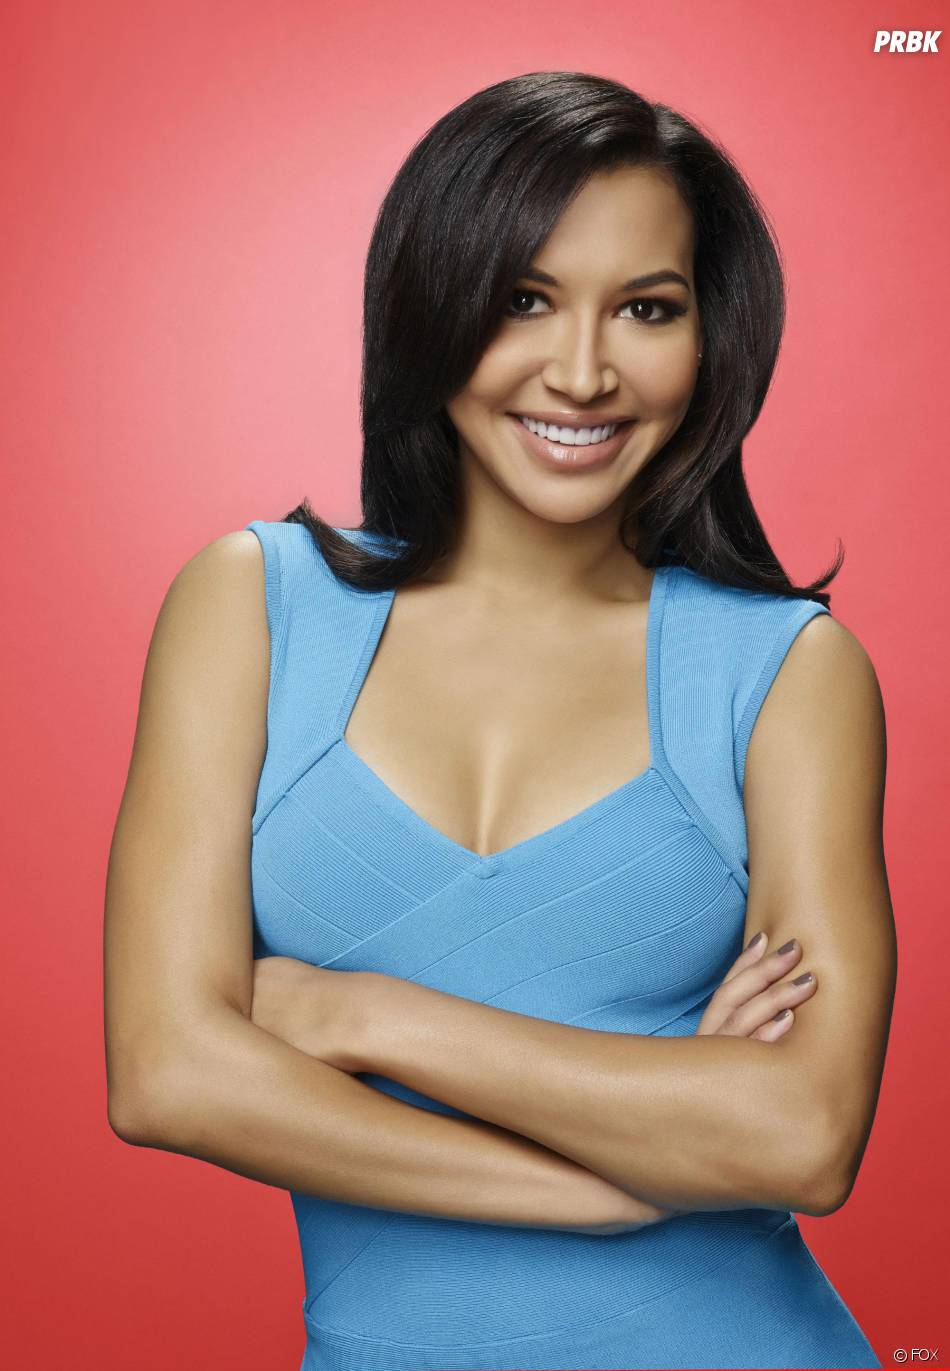 Glee saison 6 : Naya Rivera (Santana) sur une photo promo